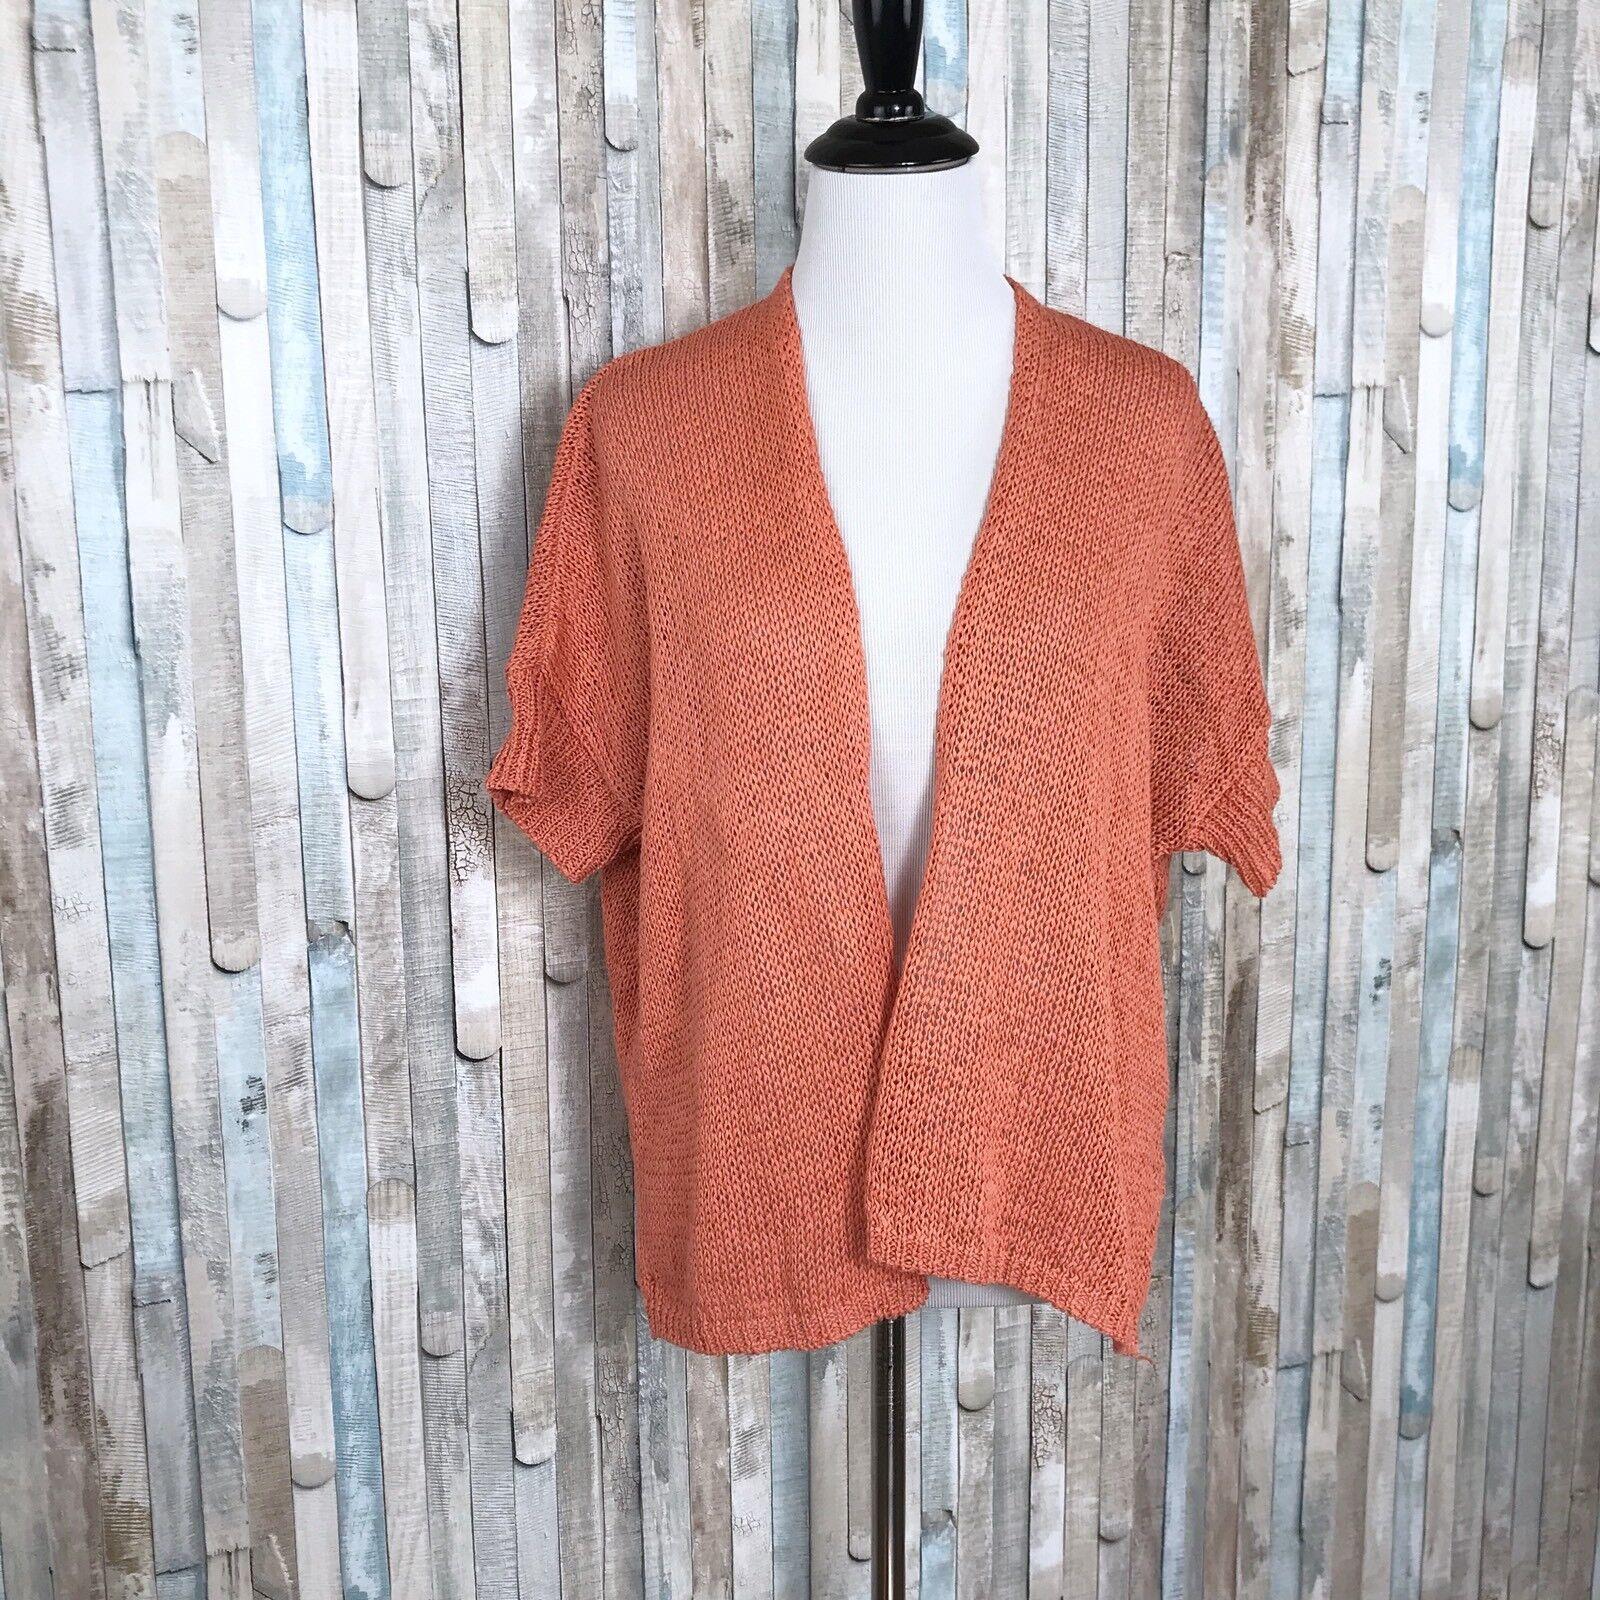 Eileen Fisher XS orange Peach Organic Organic Organic Cotton Knit Shrug Open Cardigan Sweater b91d2b